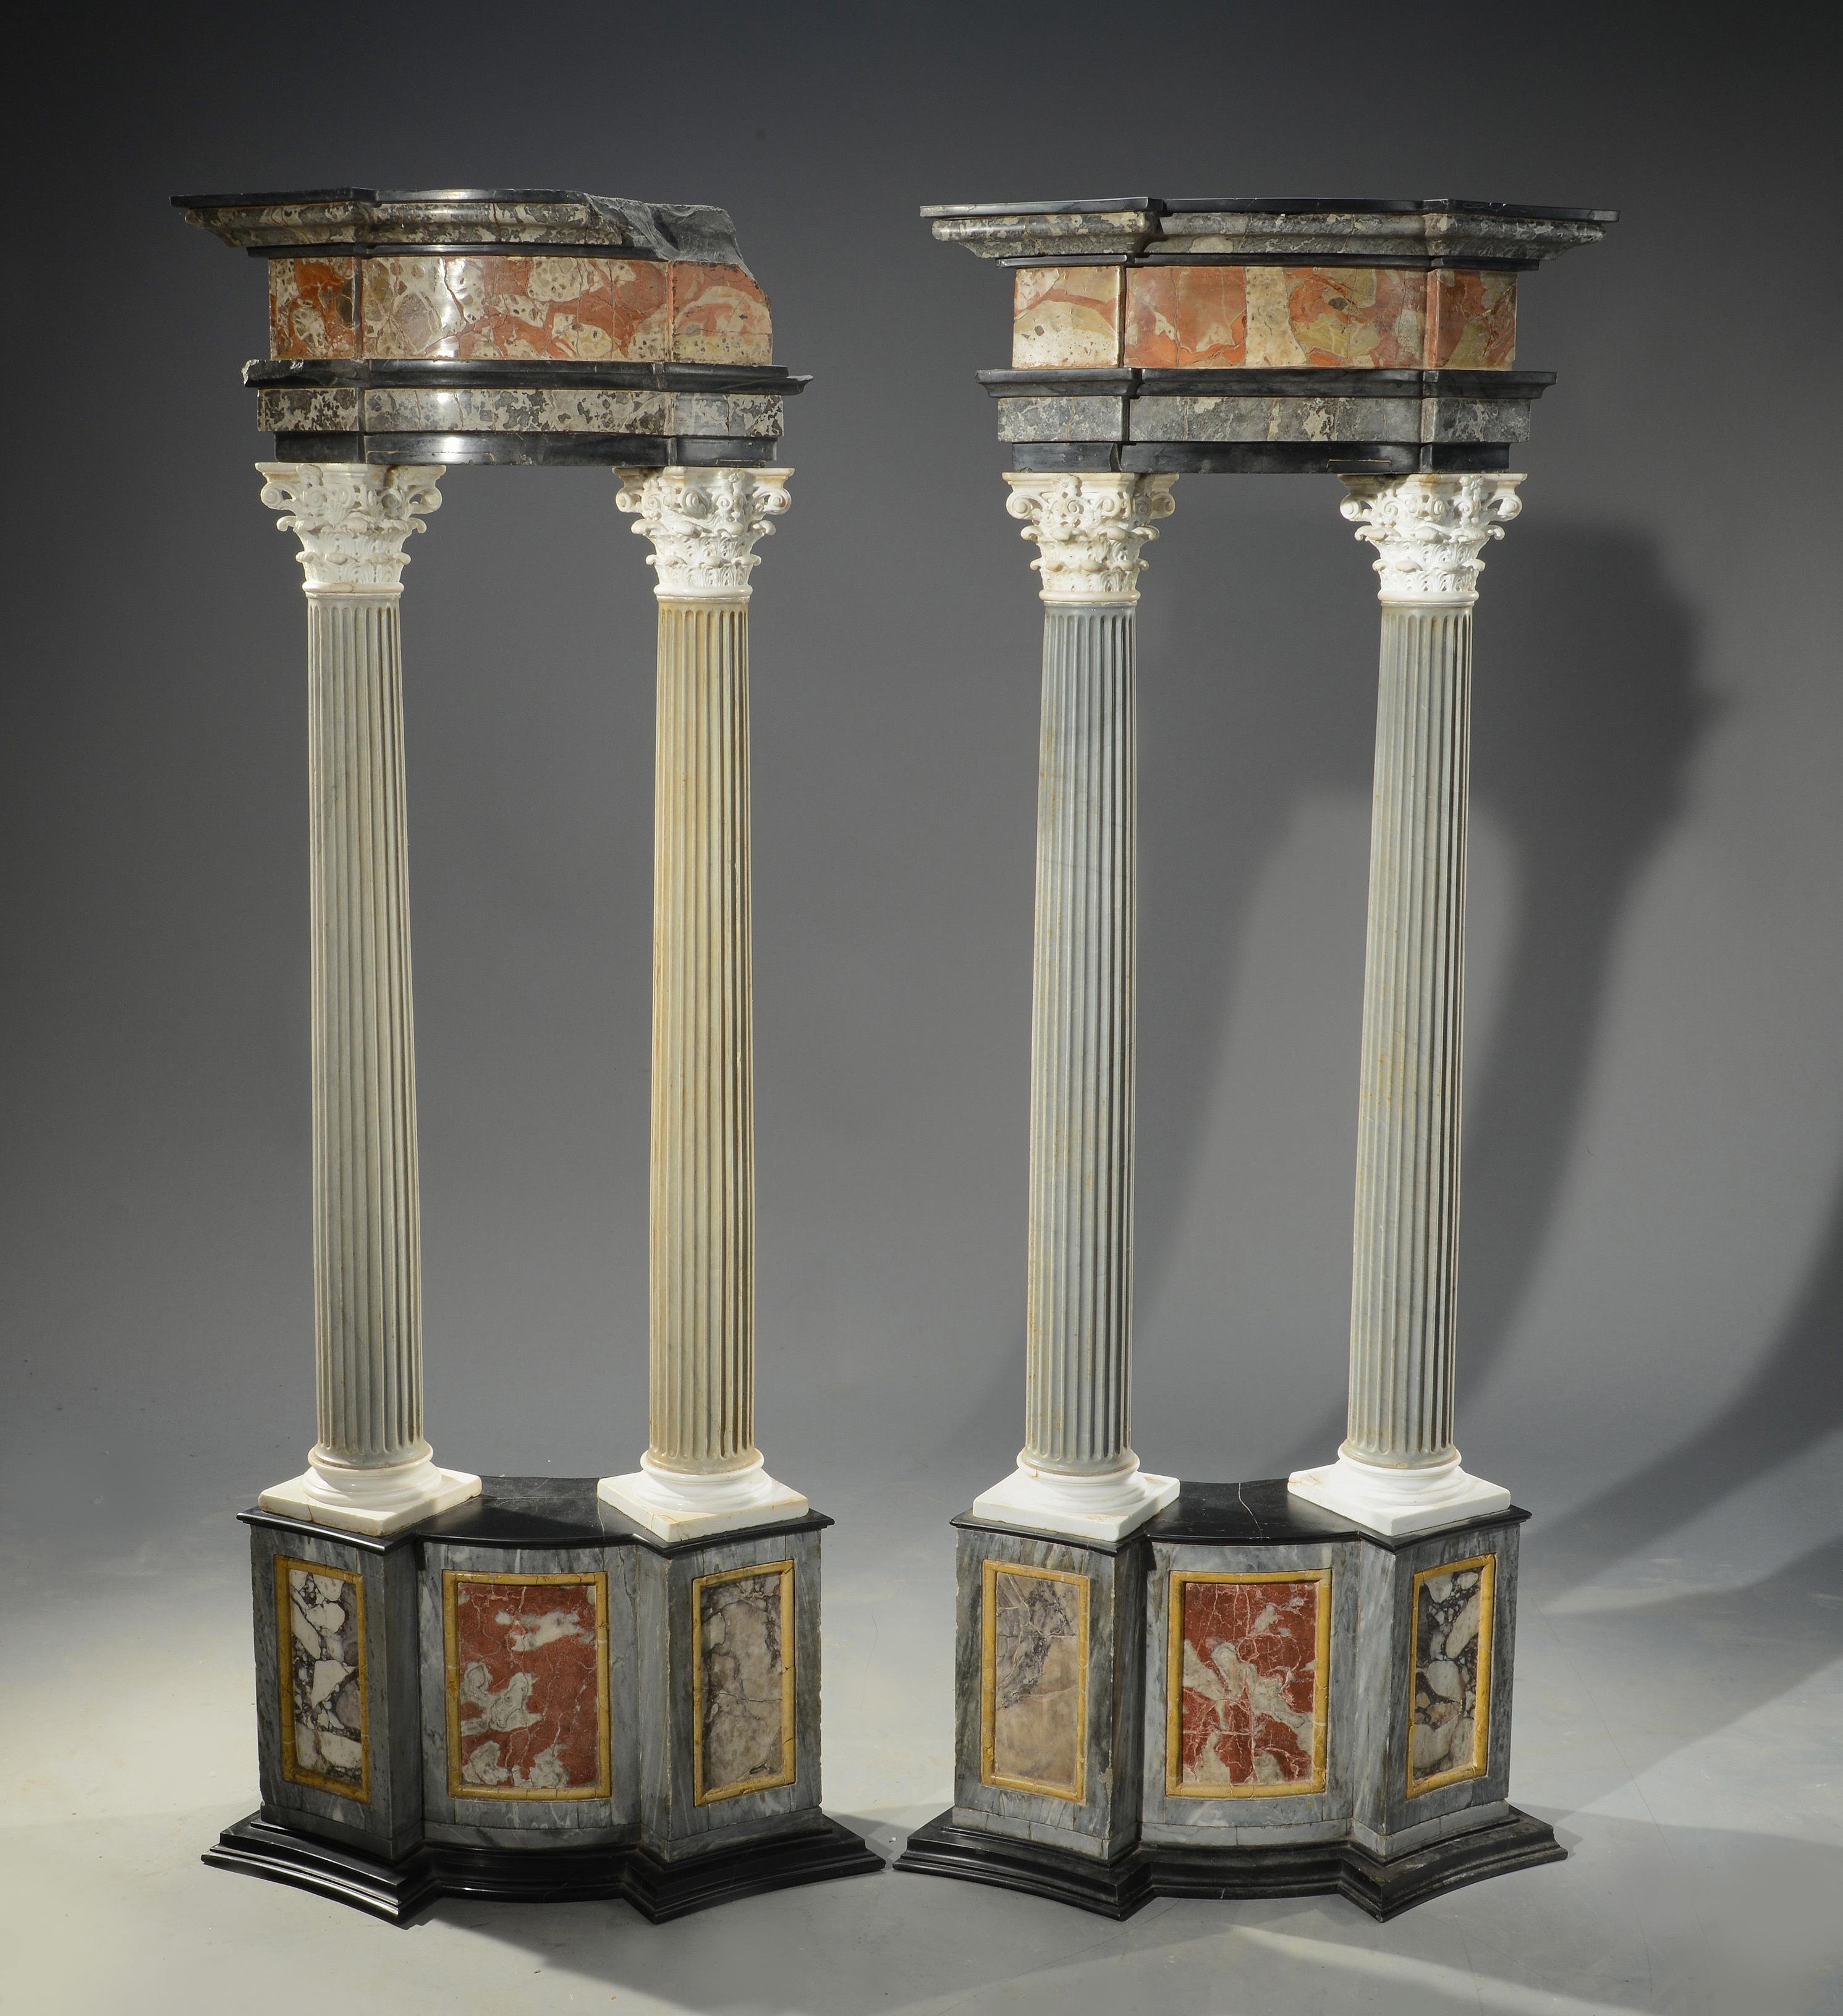 Pair of architectural columns, 19th century